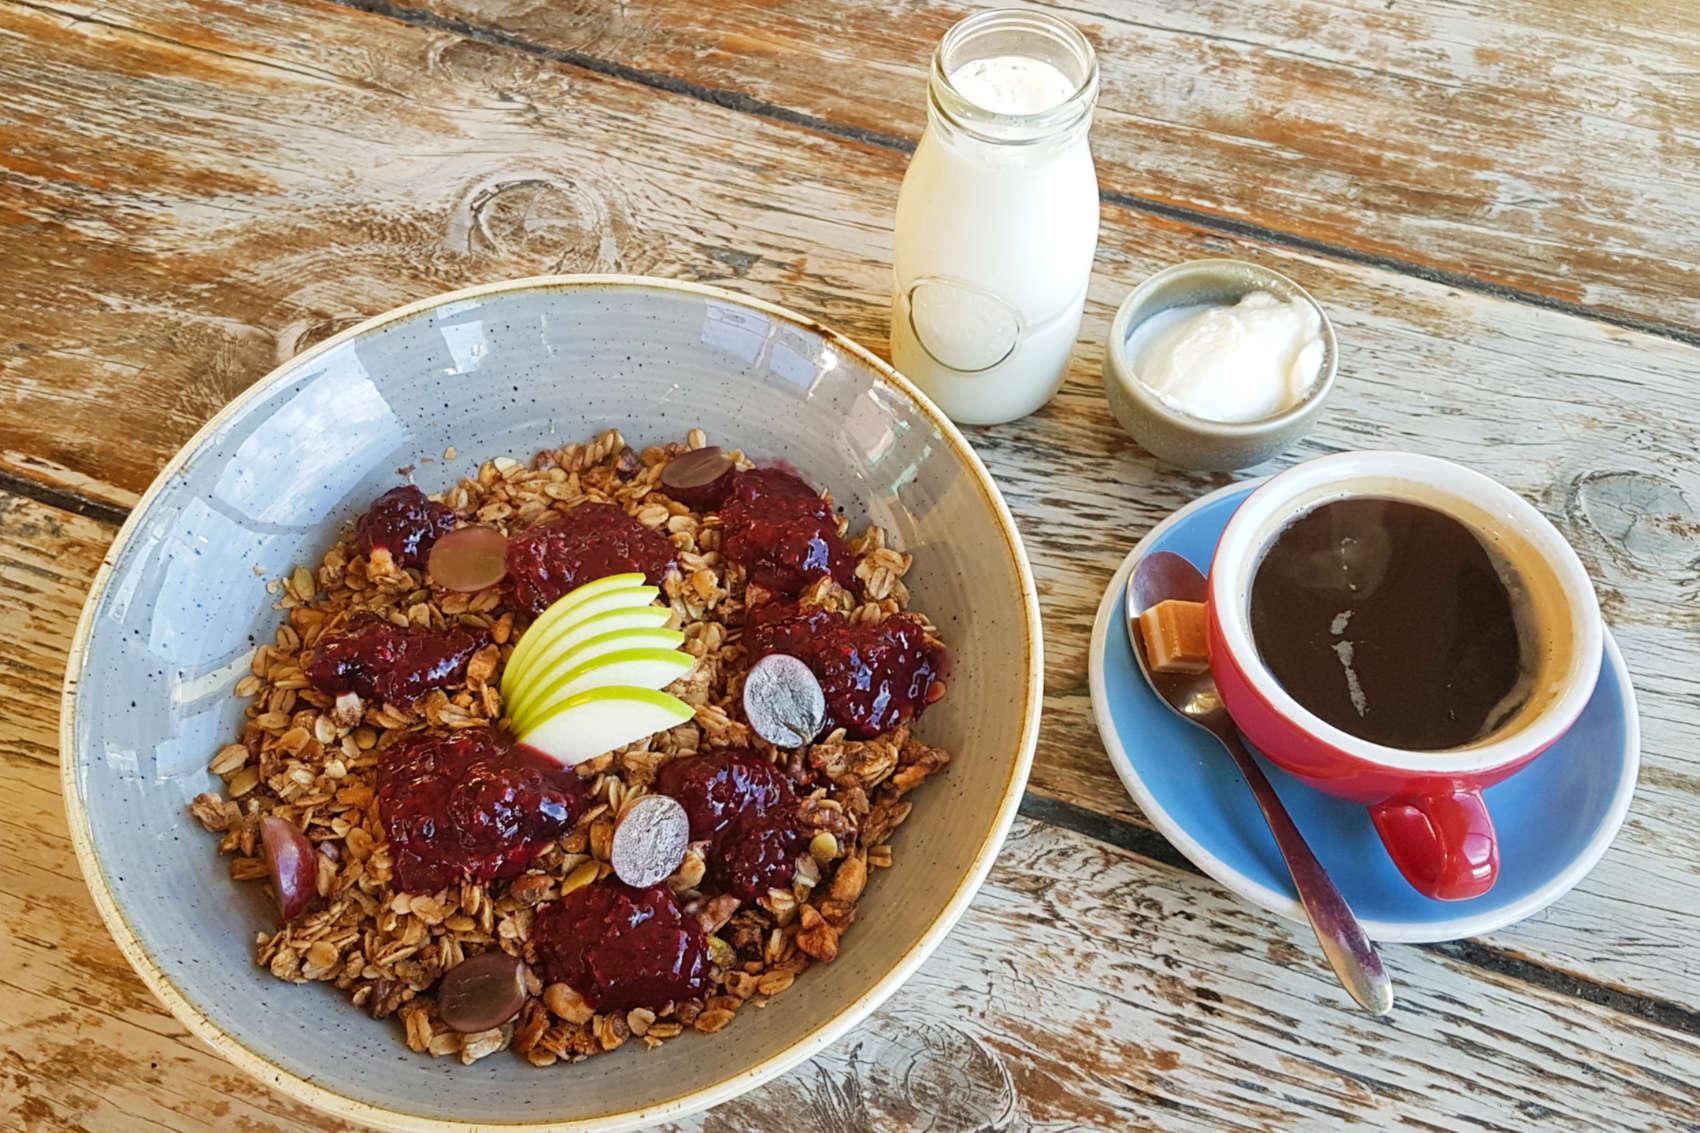 Coenes granola and coffee